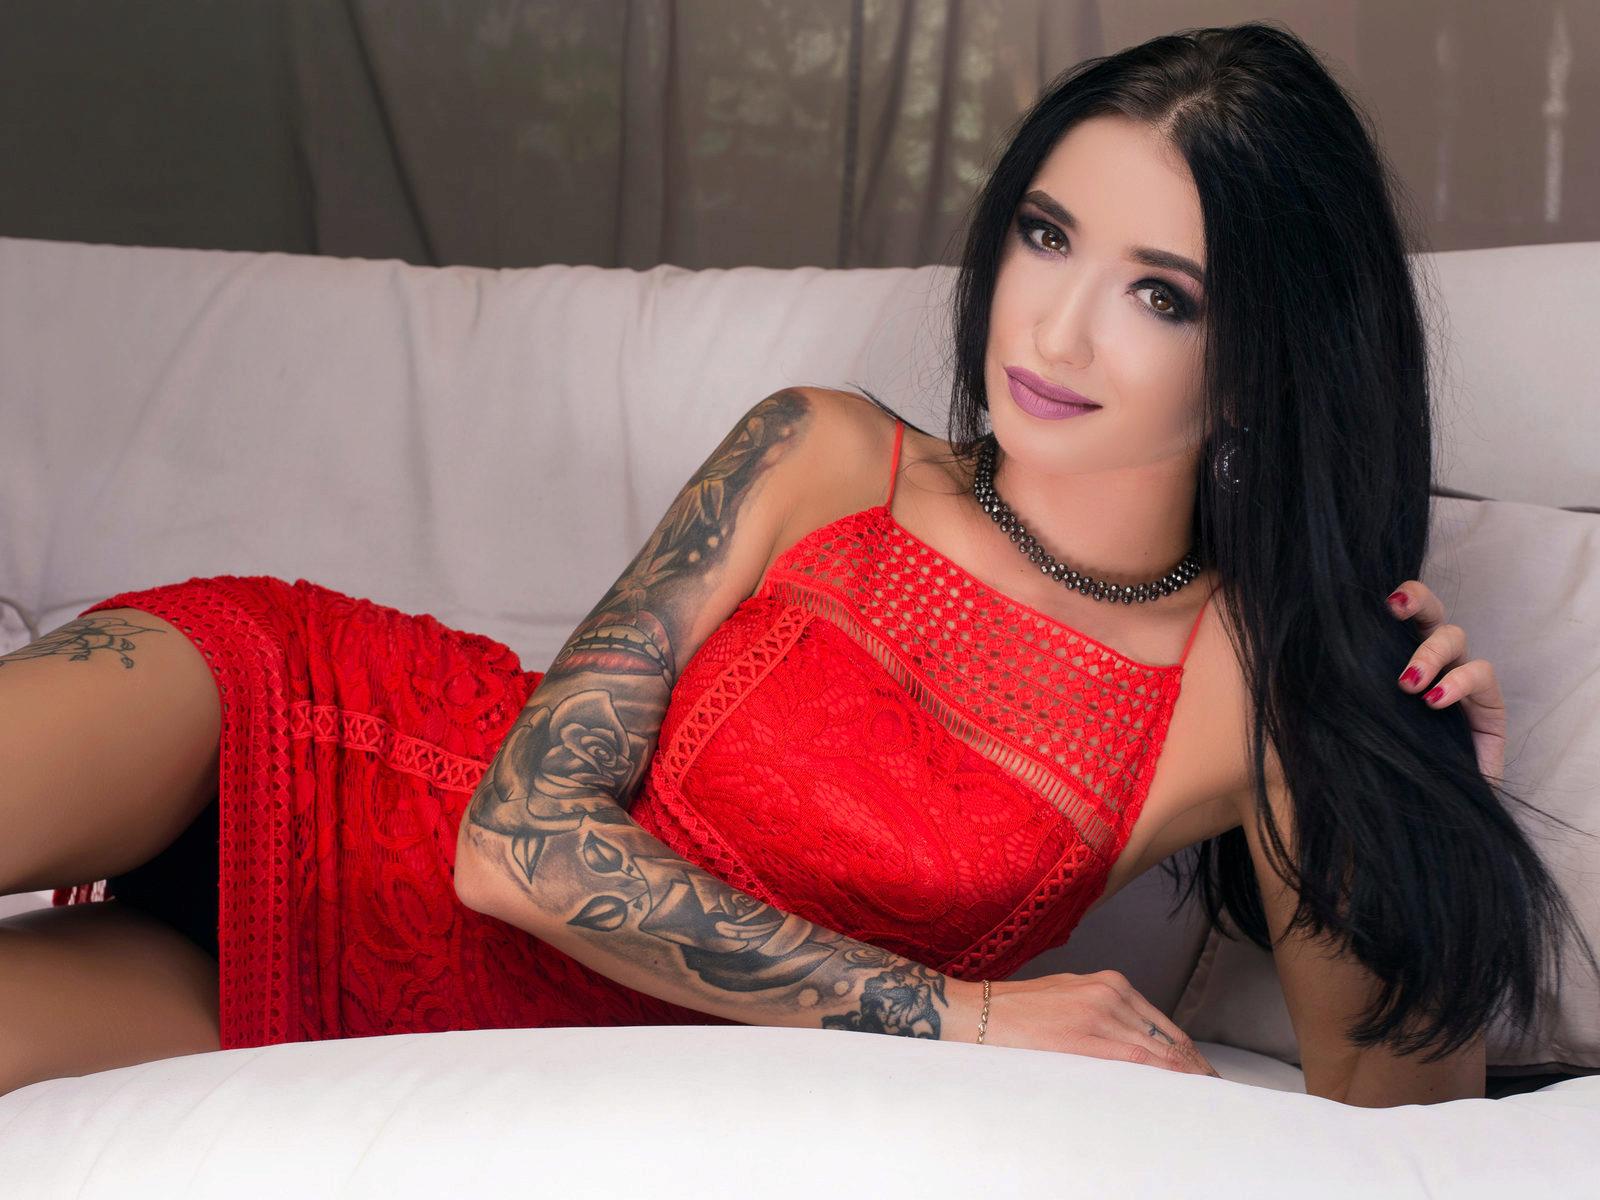 Katlyn sex chat